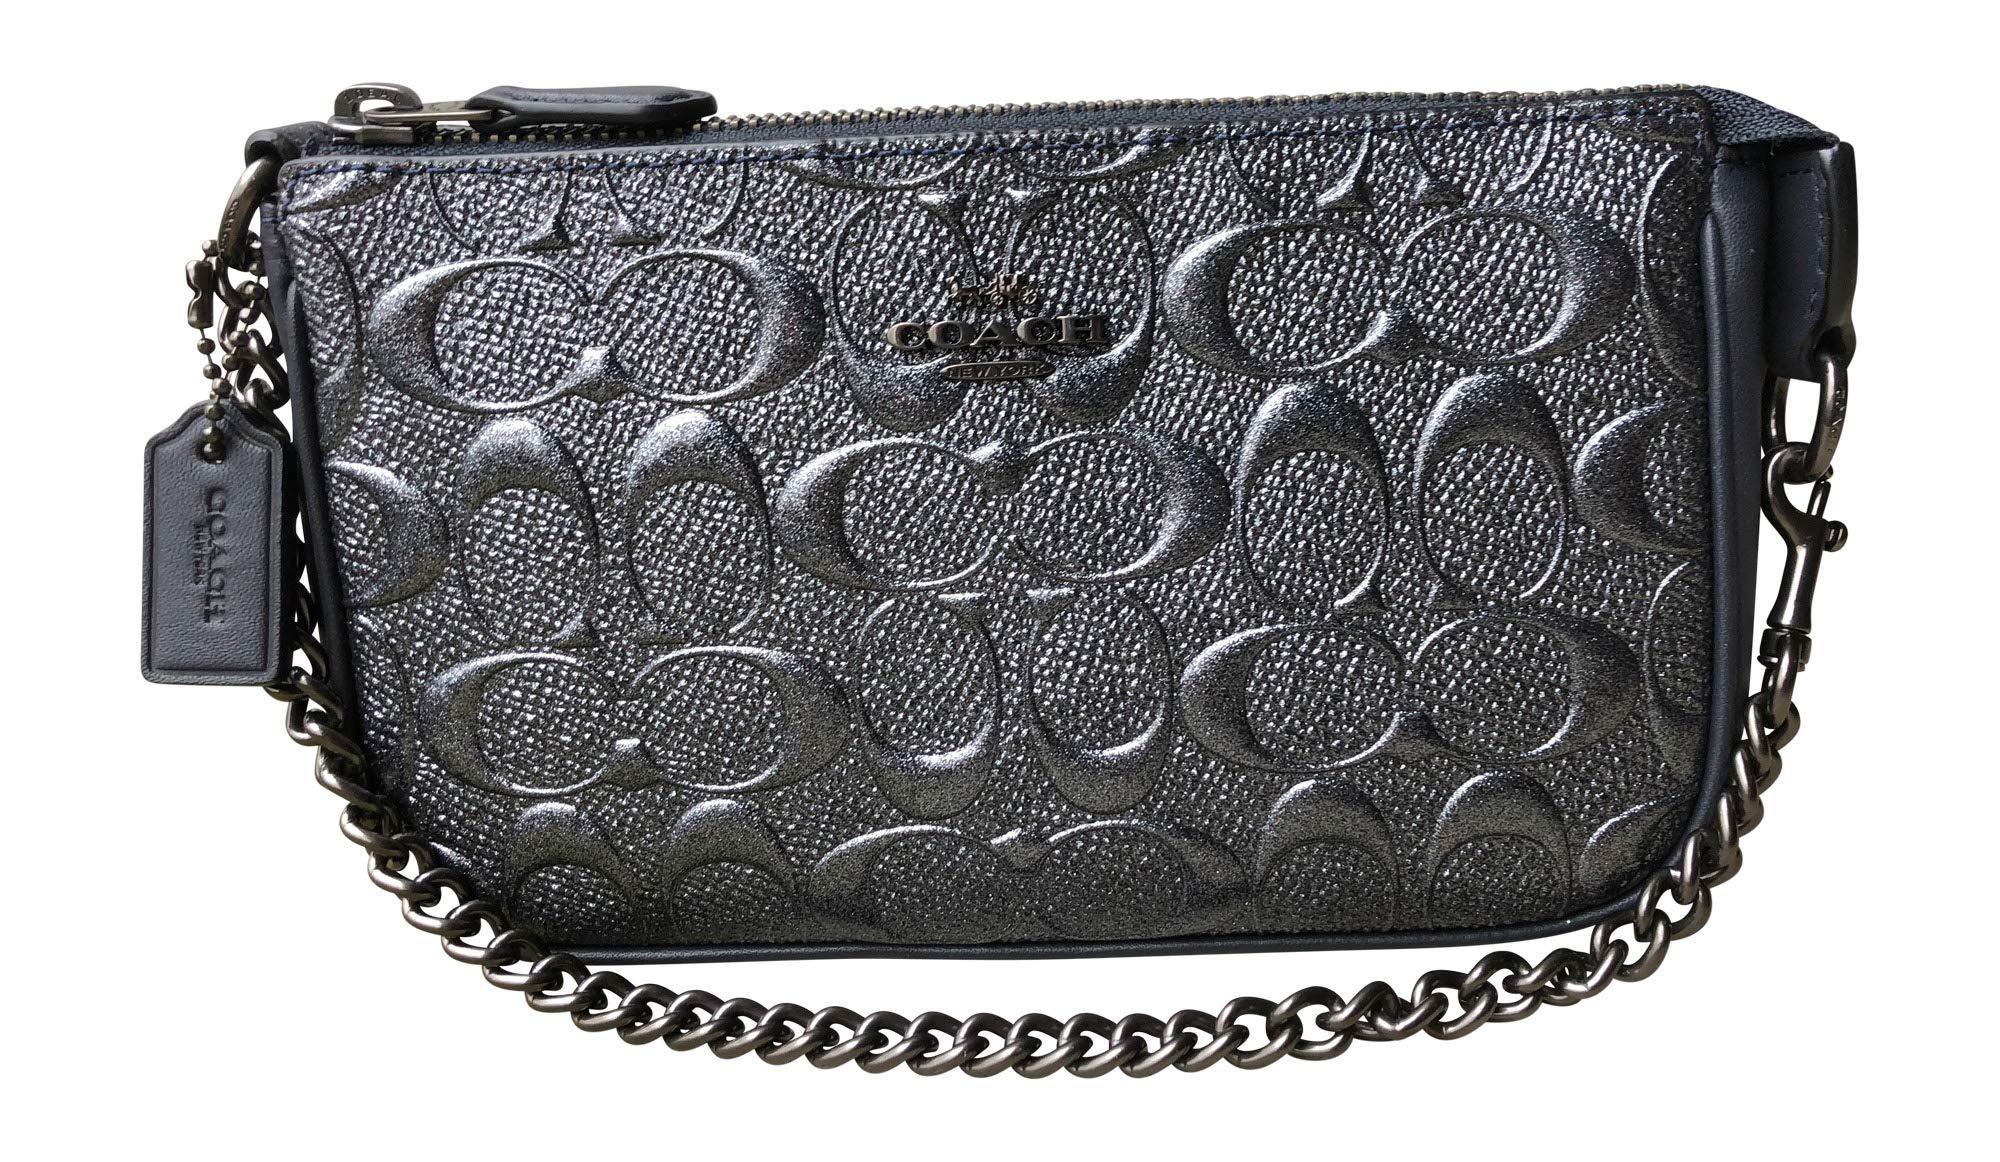 Coach Signature Debossed Patent Leather Large Wristlet Handbag (Charcoal)